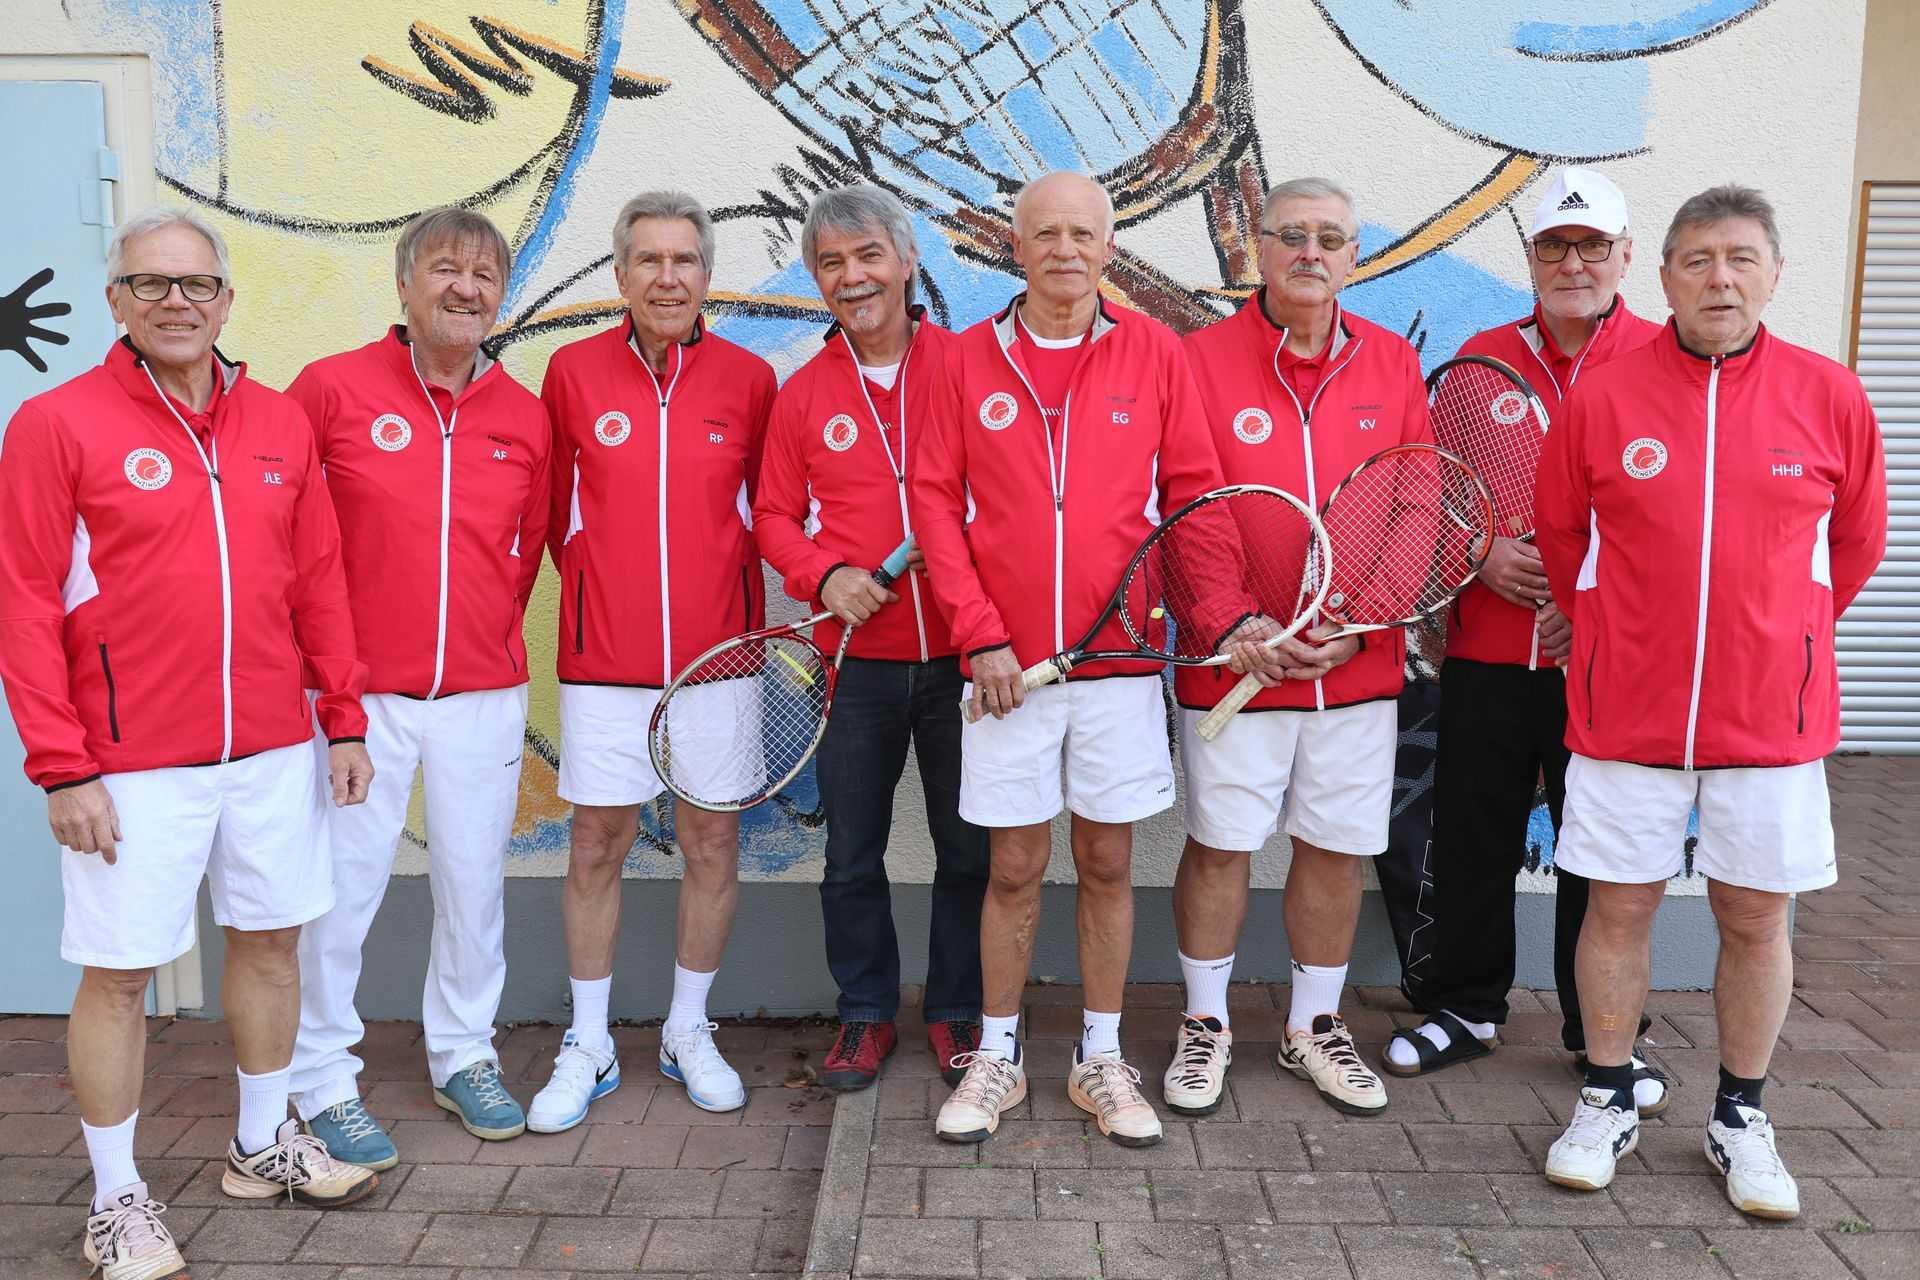 Tennisverein Kenzingen manschafte 21